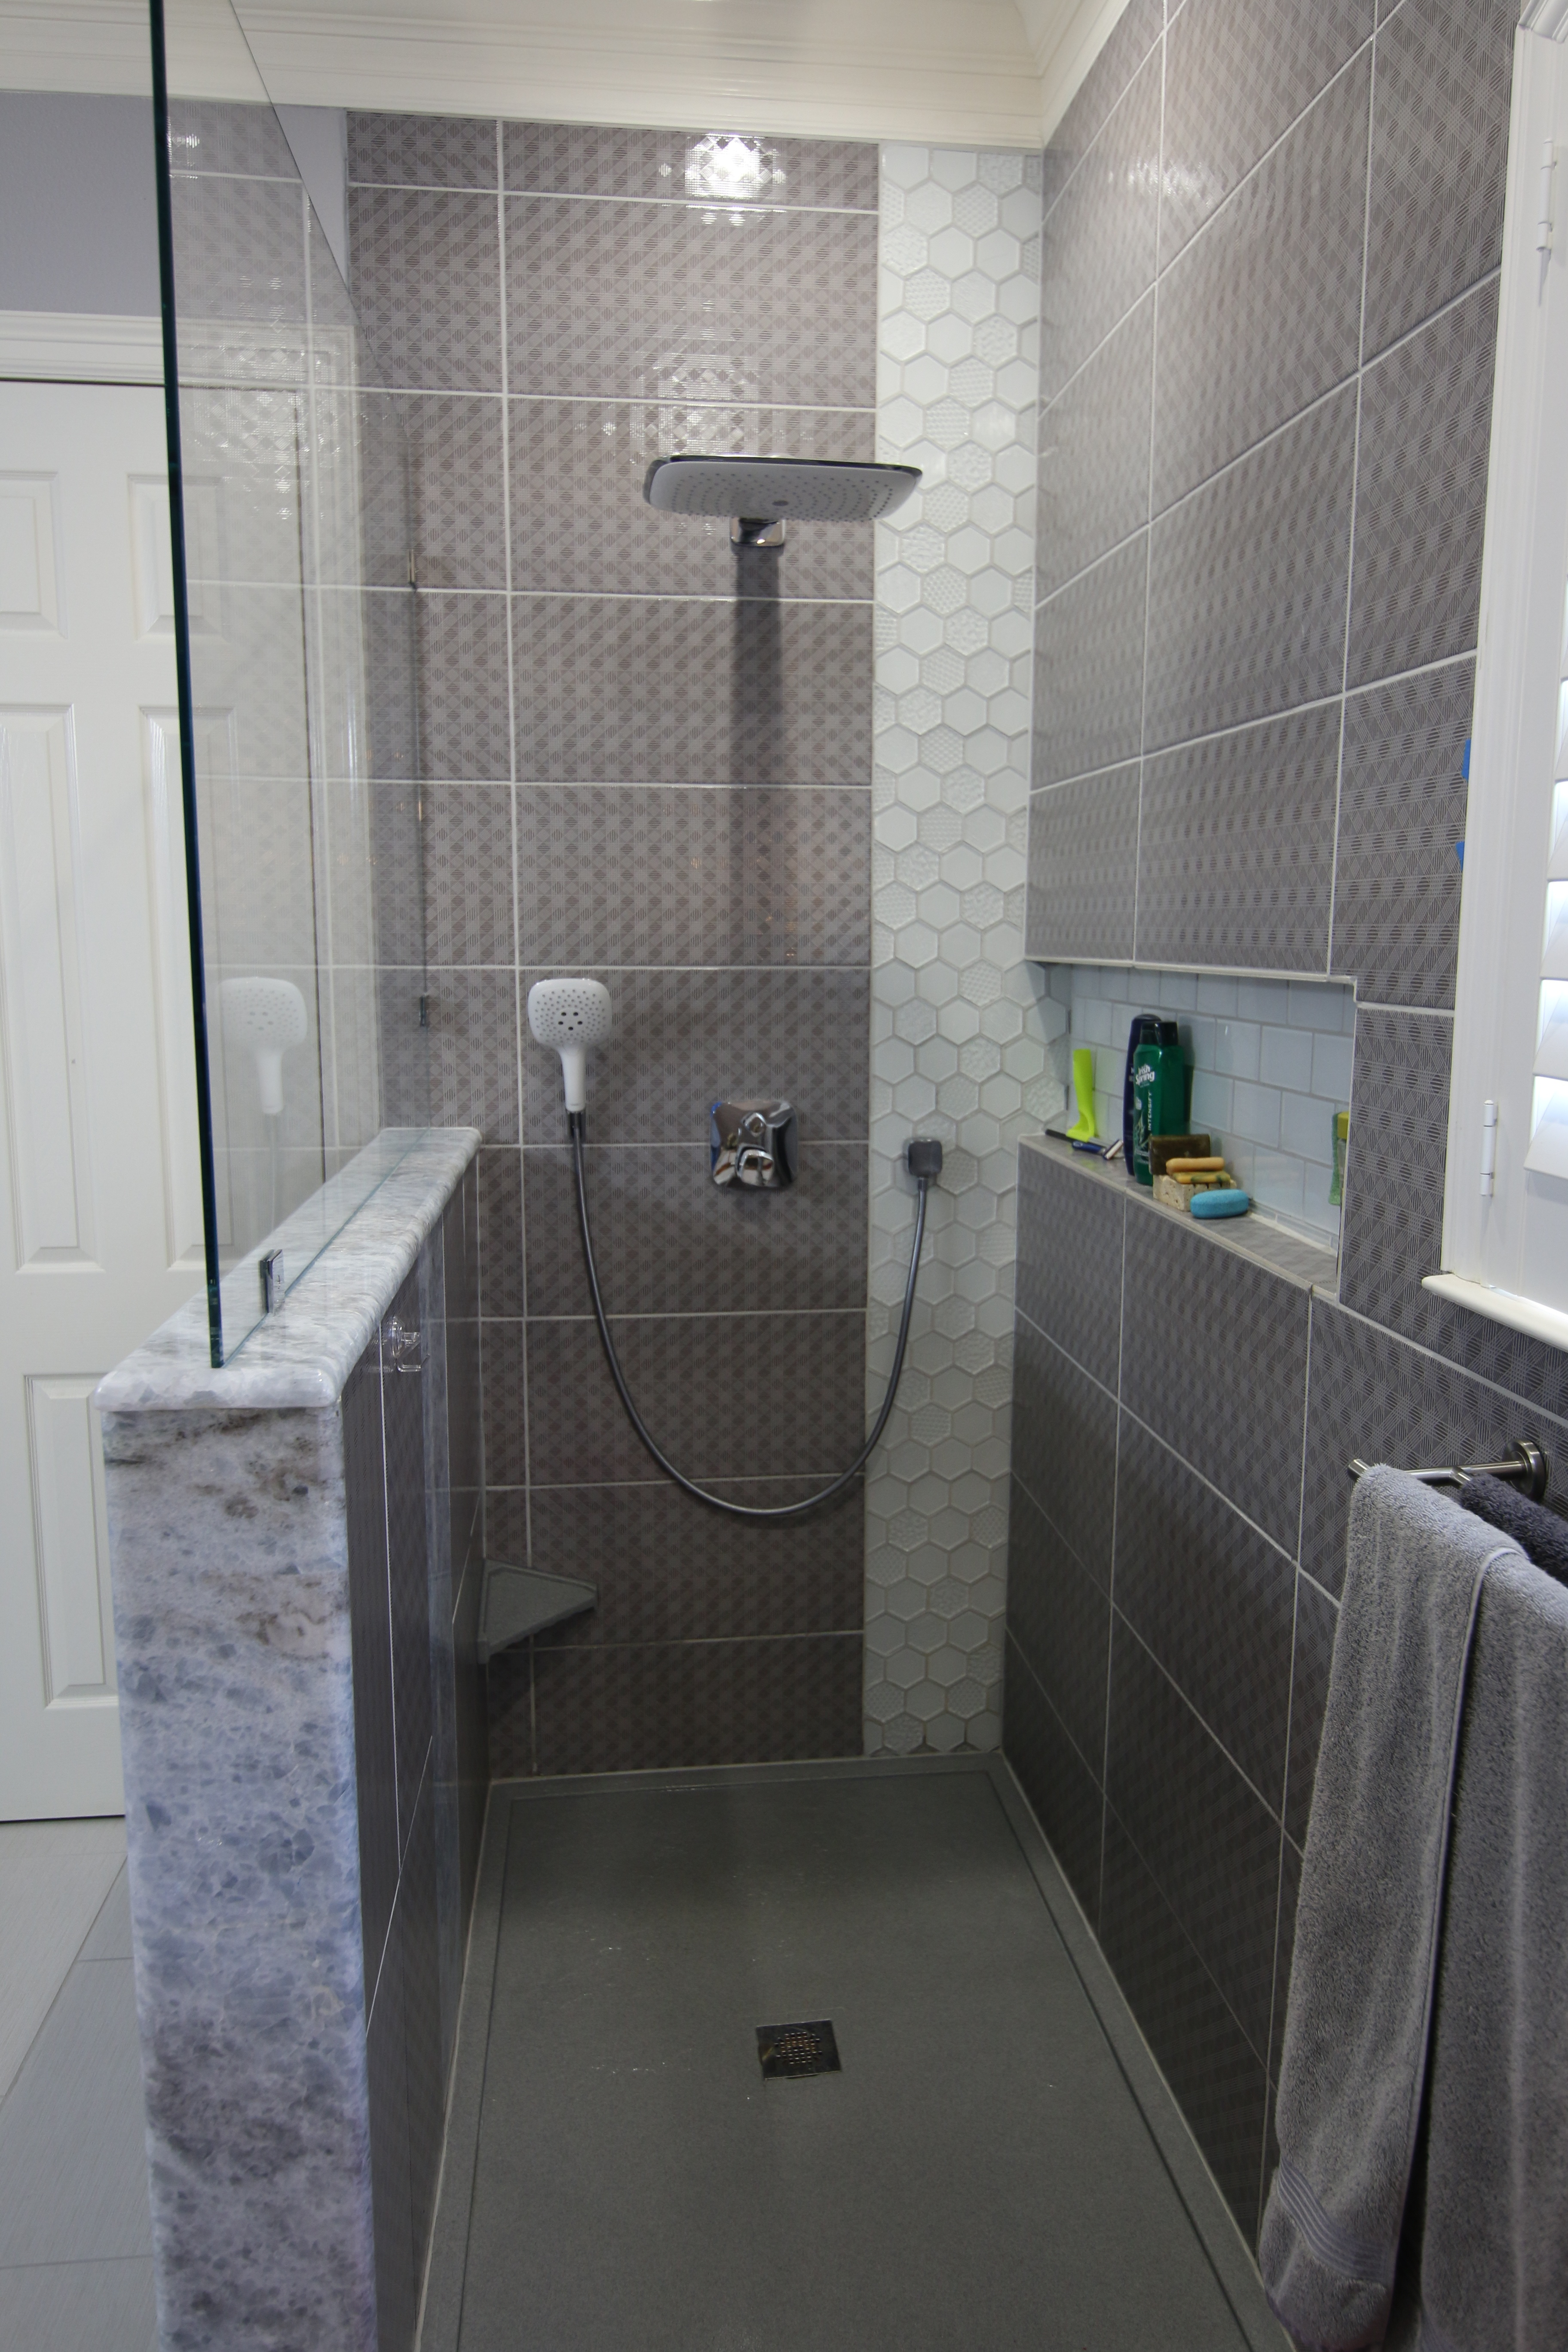 austin bathroom remodeling. Austin Bathroom Remodeling G